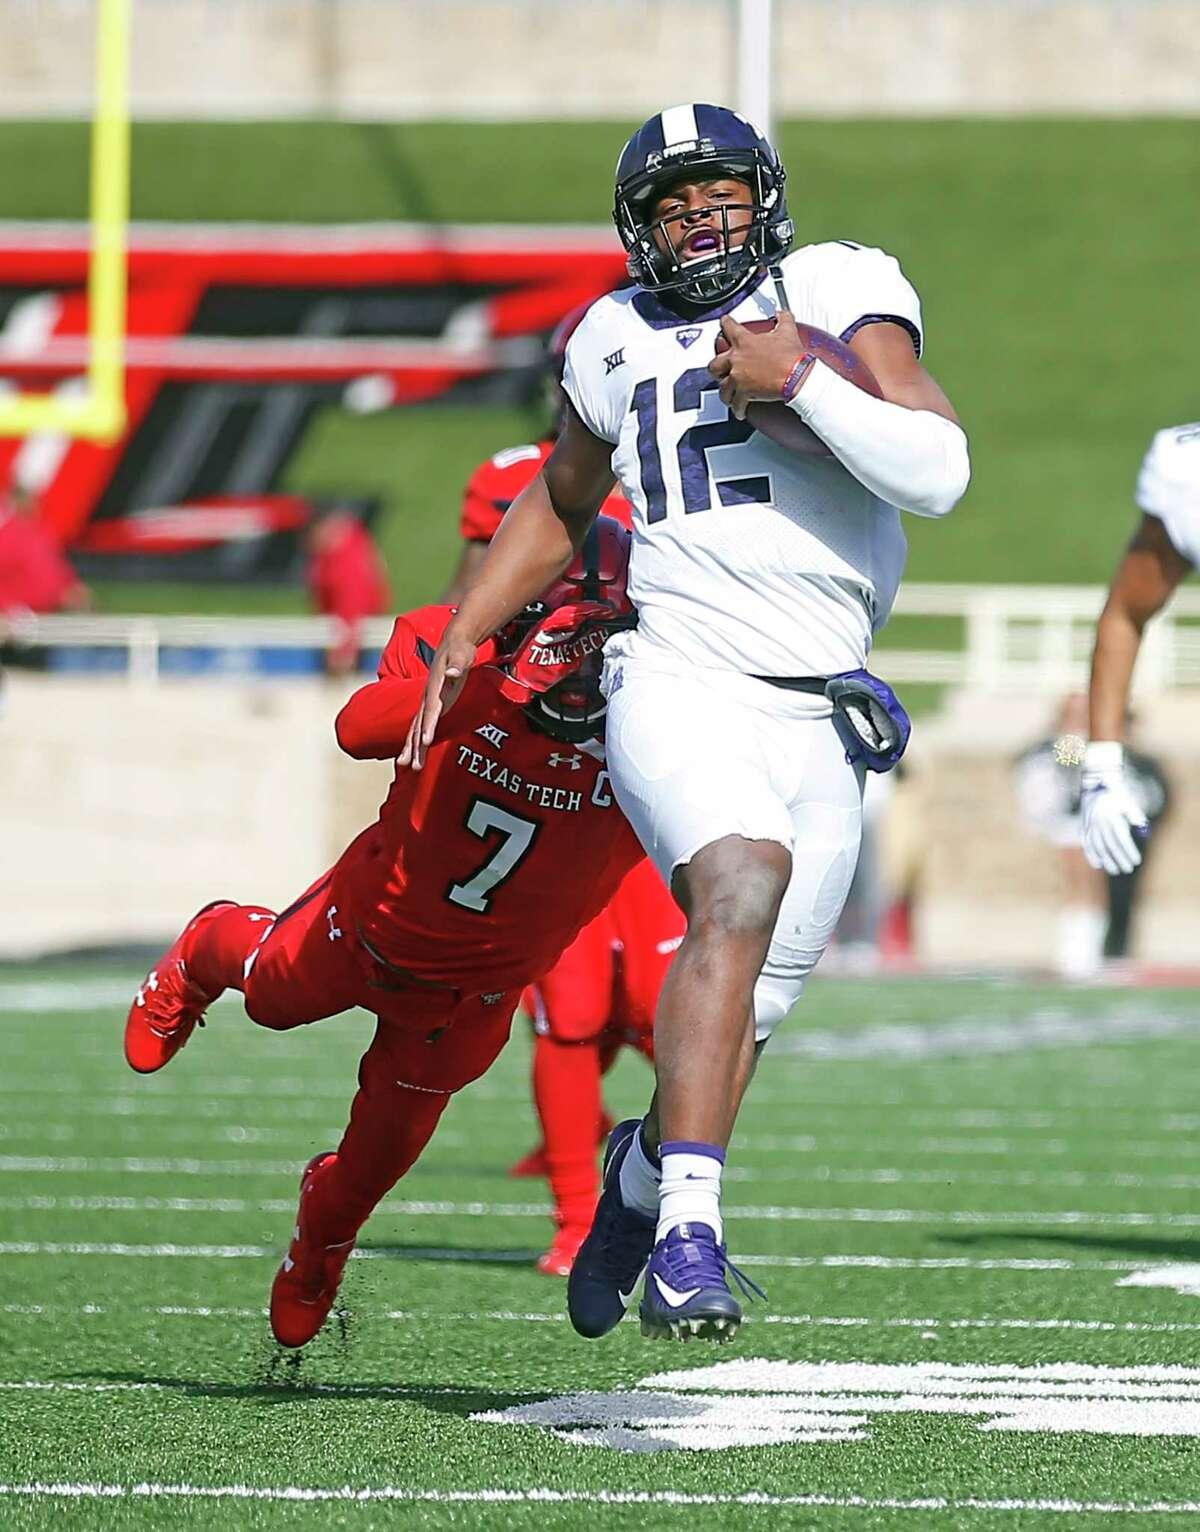 TCU's Shawn Robinson (12) runs away from Texas Tech's Jah'Shawn Johnson (7) during the first half of an NCAA college football game, Saturday, Nov. 18, 2017, in Lubbock, Texas. (AP Photo/Brad Tollefson)